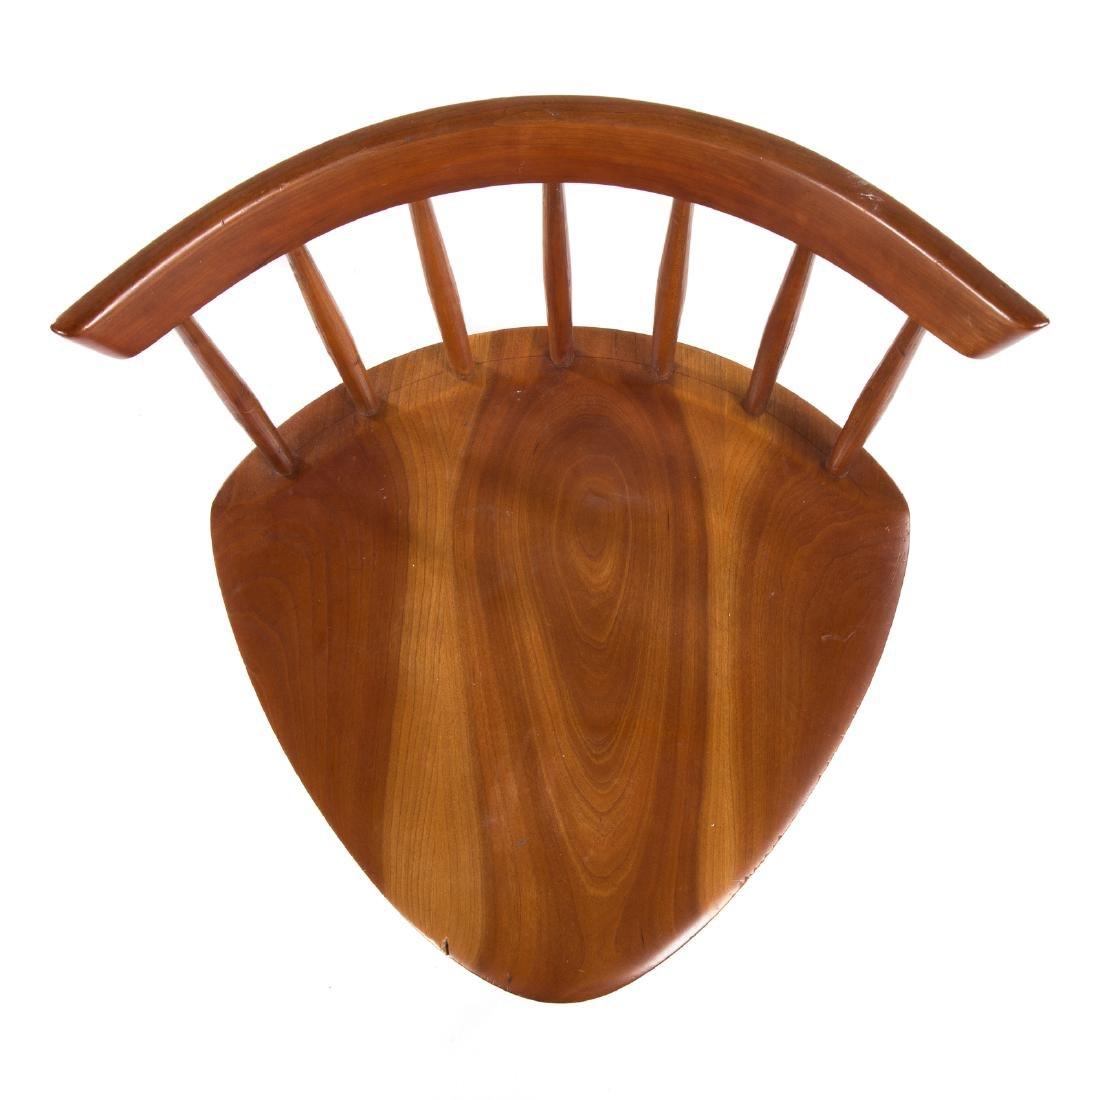 Two George Nakashima Mira Chairs - 5